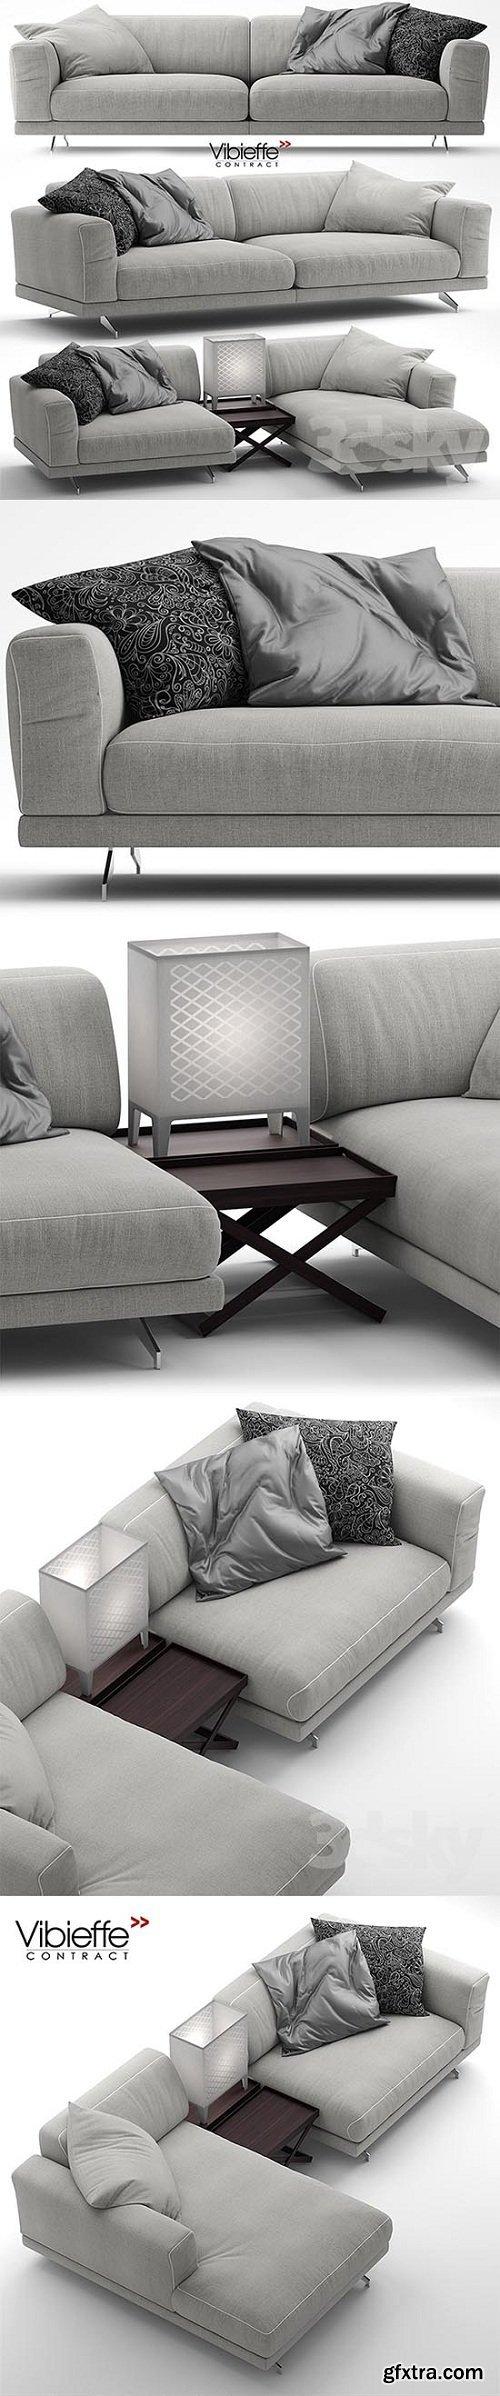 Sofa Vibieffe 470 FANCY Sectional